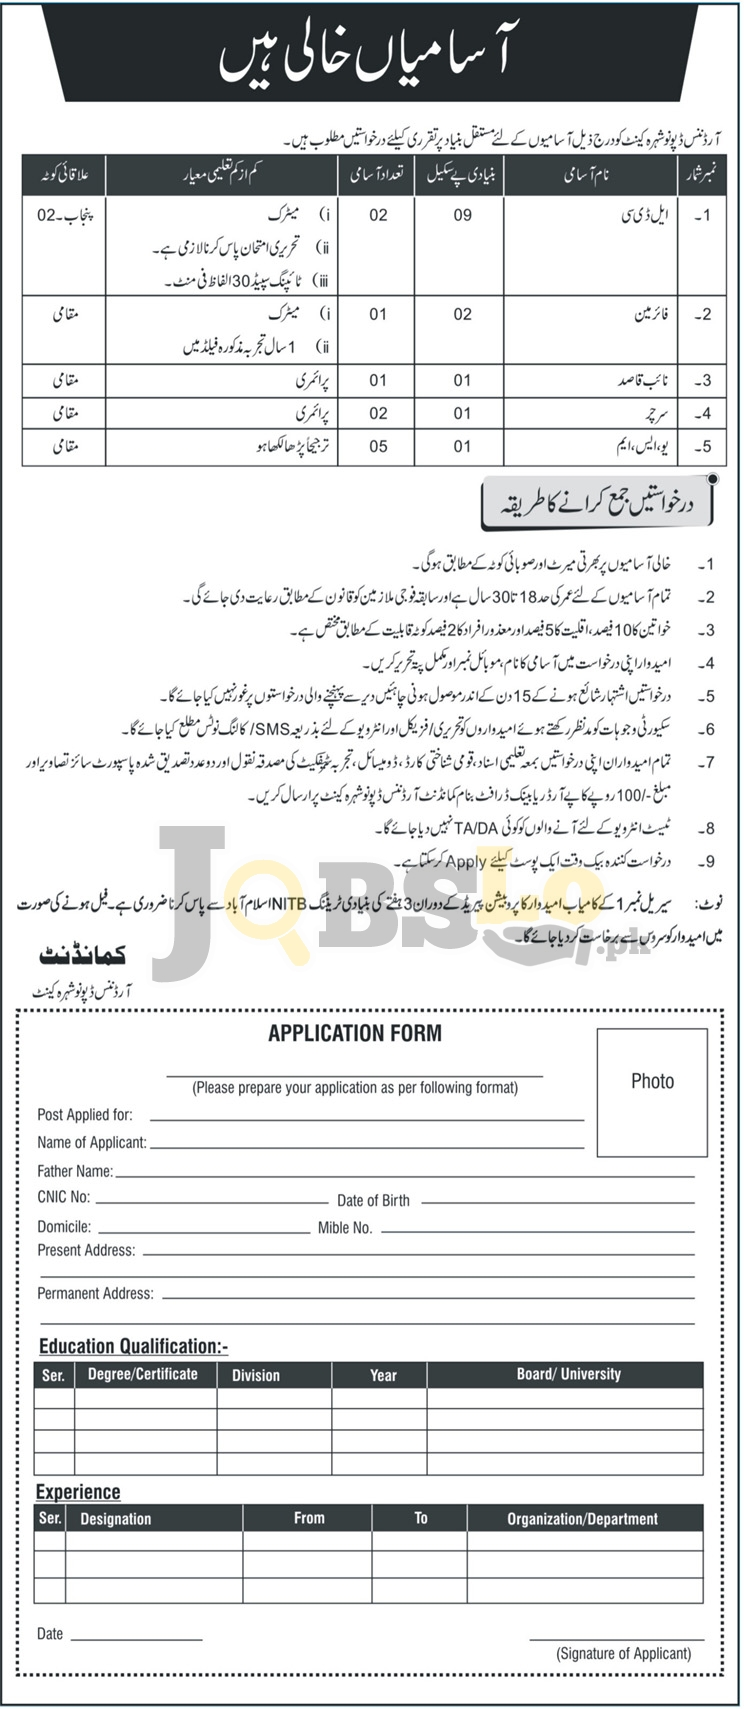 Ordnance Depot Jobs 2018 Pak Army Nowshera Latest Vacancies